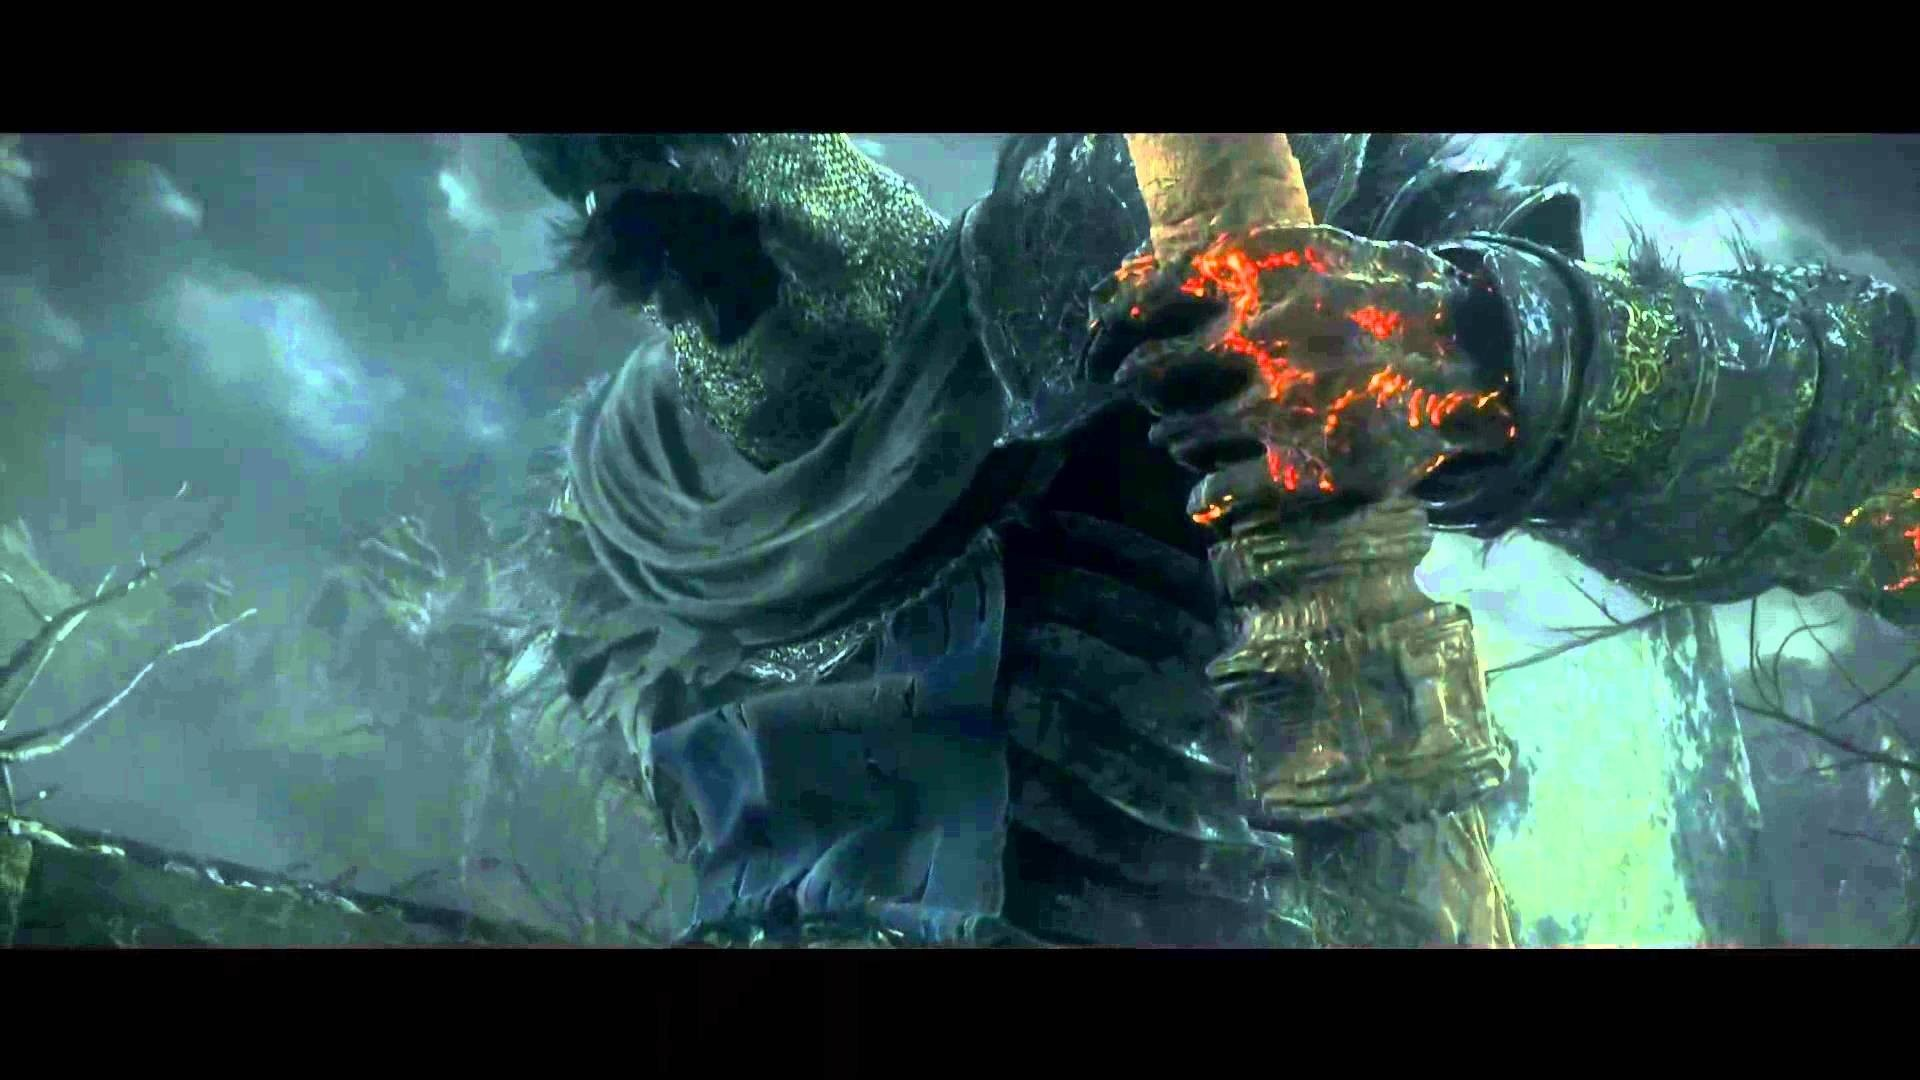 DARK SOULS 3 action rpg fighting warrior fantasy wallpaper | |  802849 | WallpaperUP